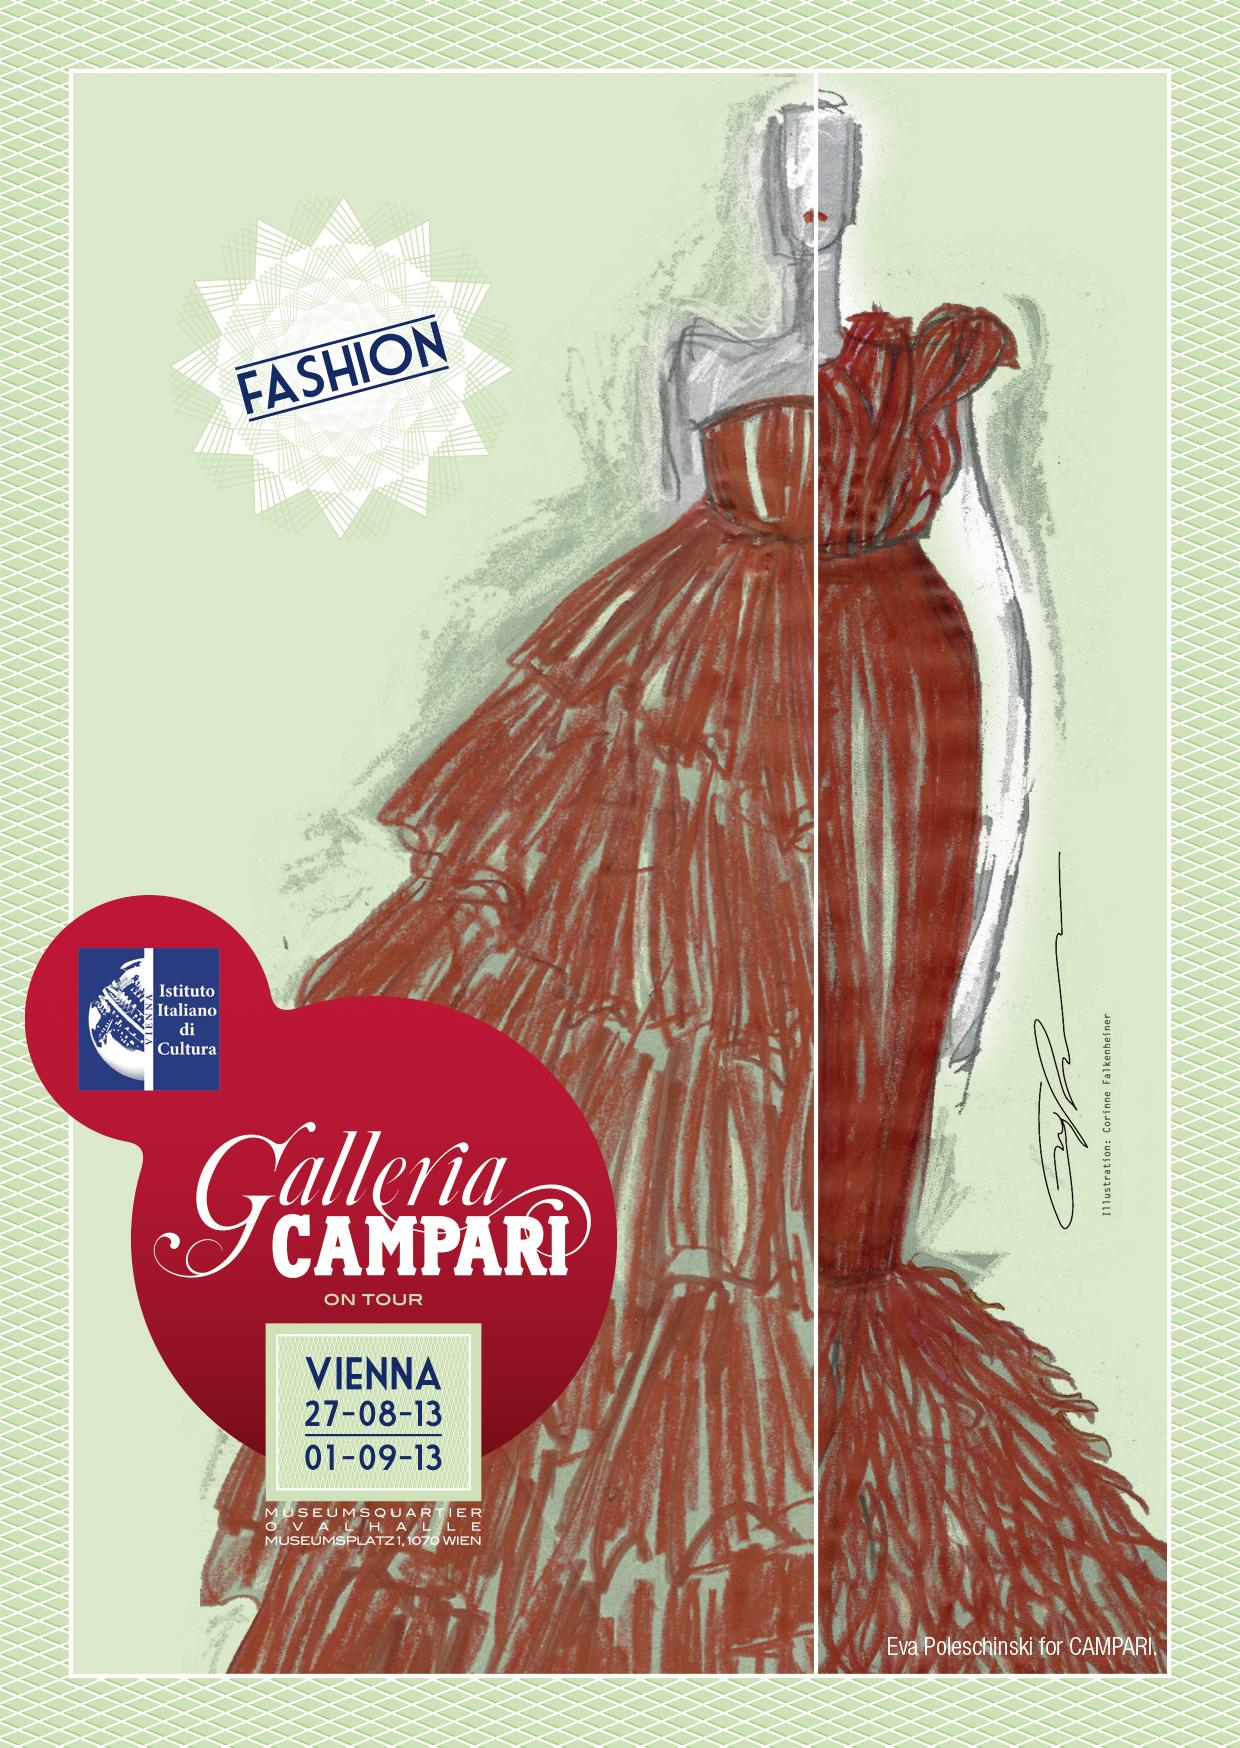 ep_anoui + Campari